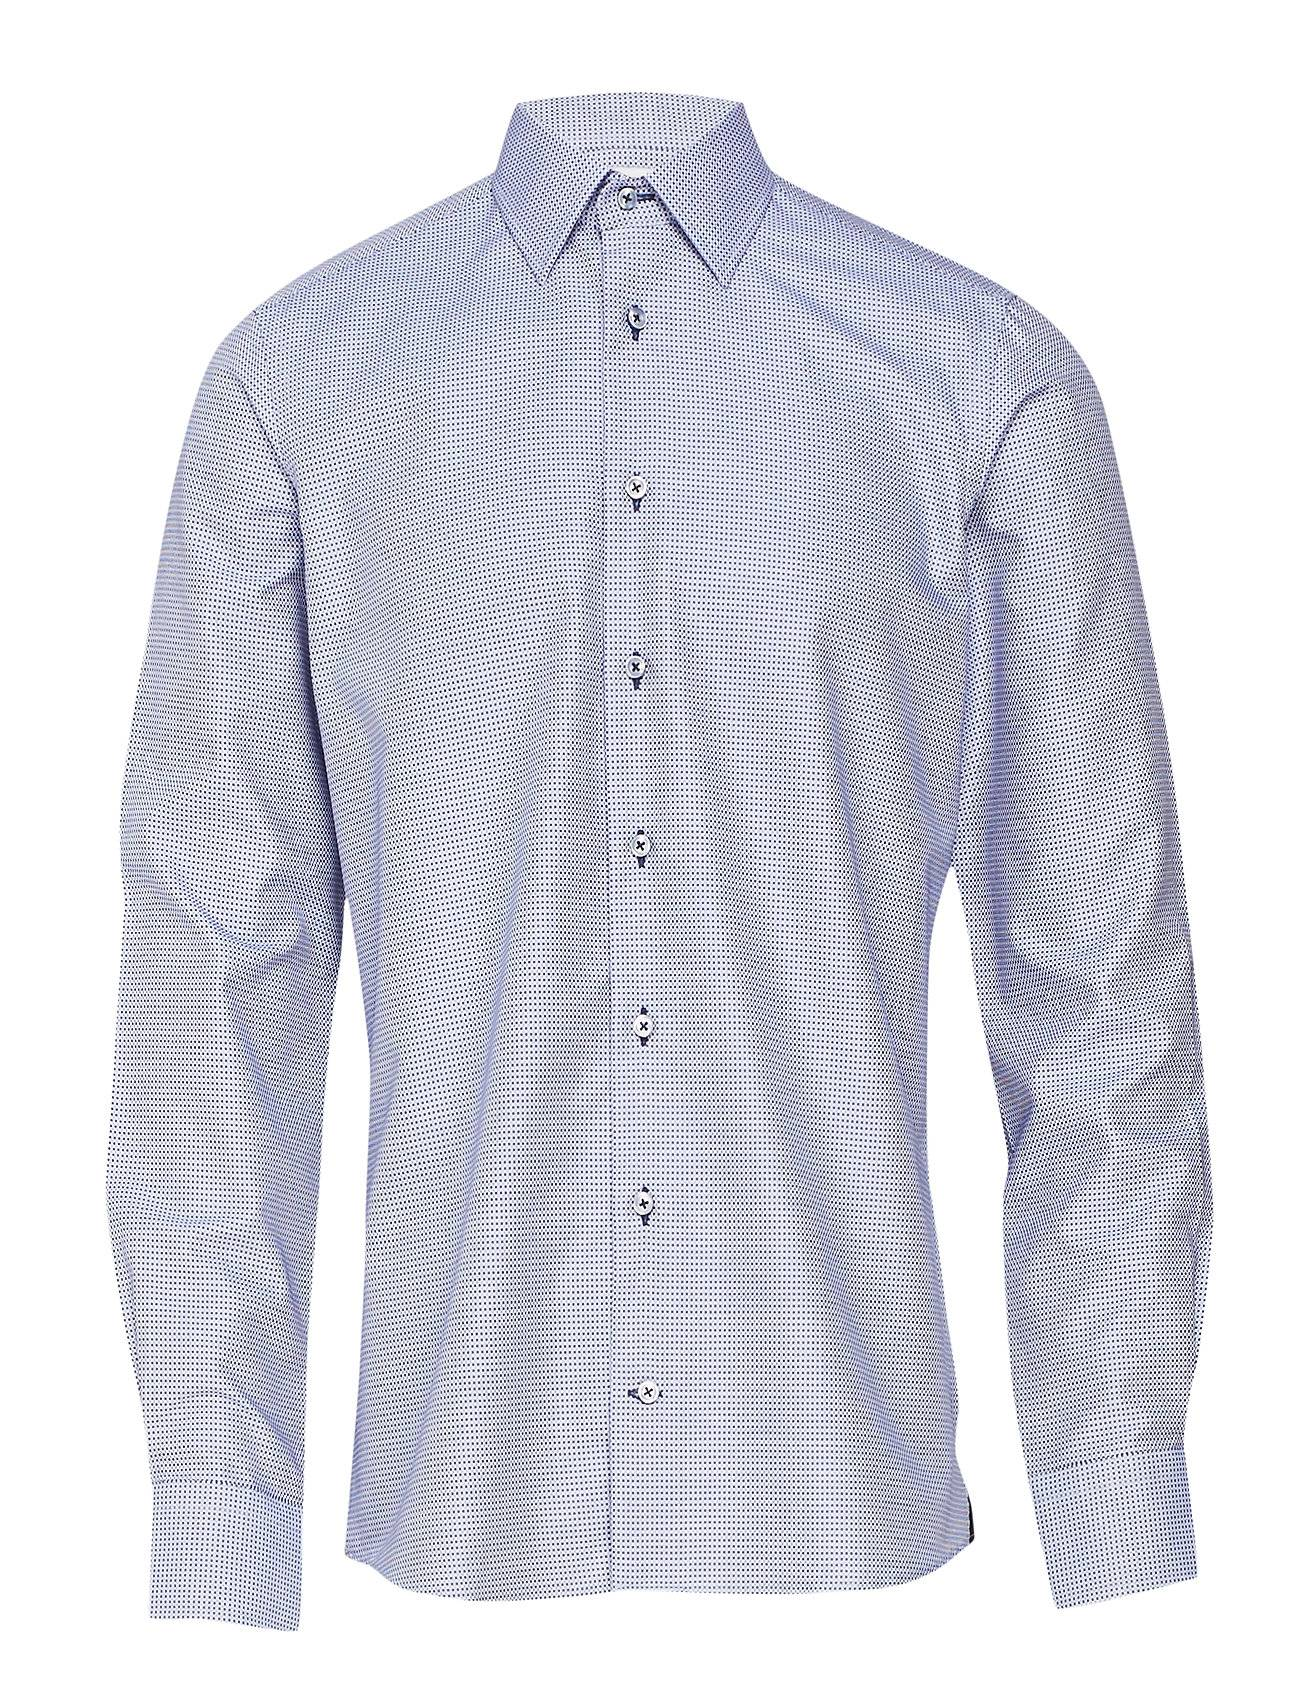 XO Shirtmaker by Sand Copenhagen 8041 - Gordon Sc